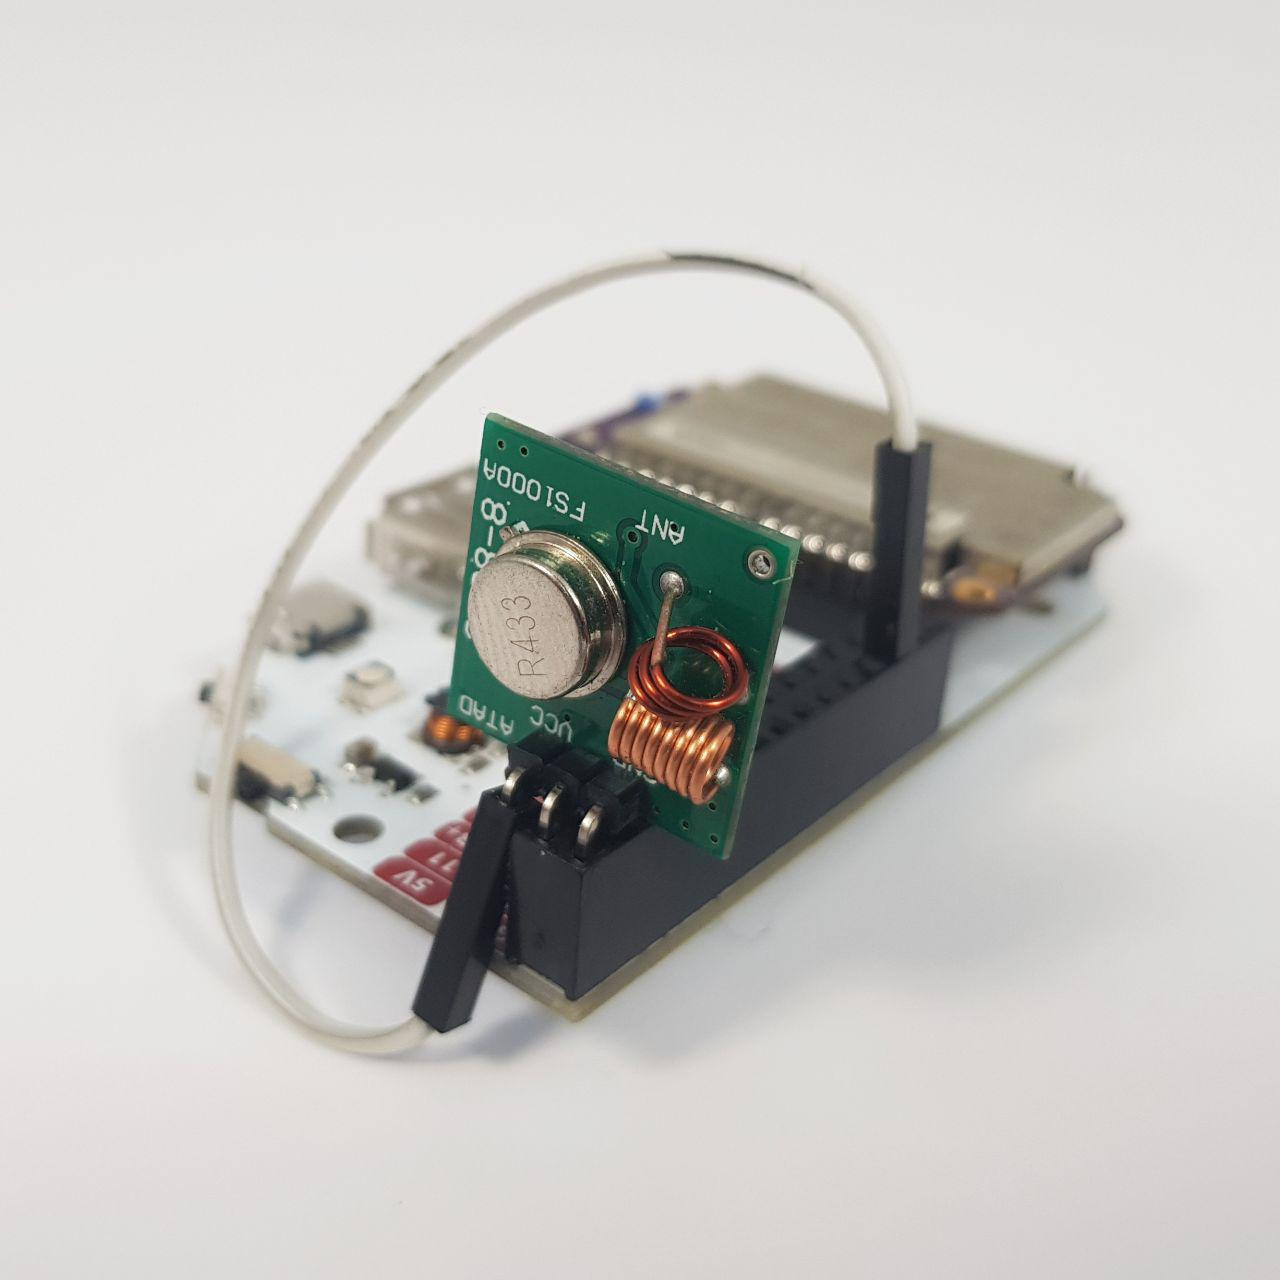 omega2 with RF transmitter